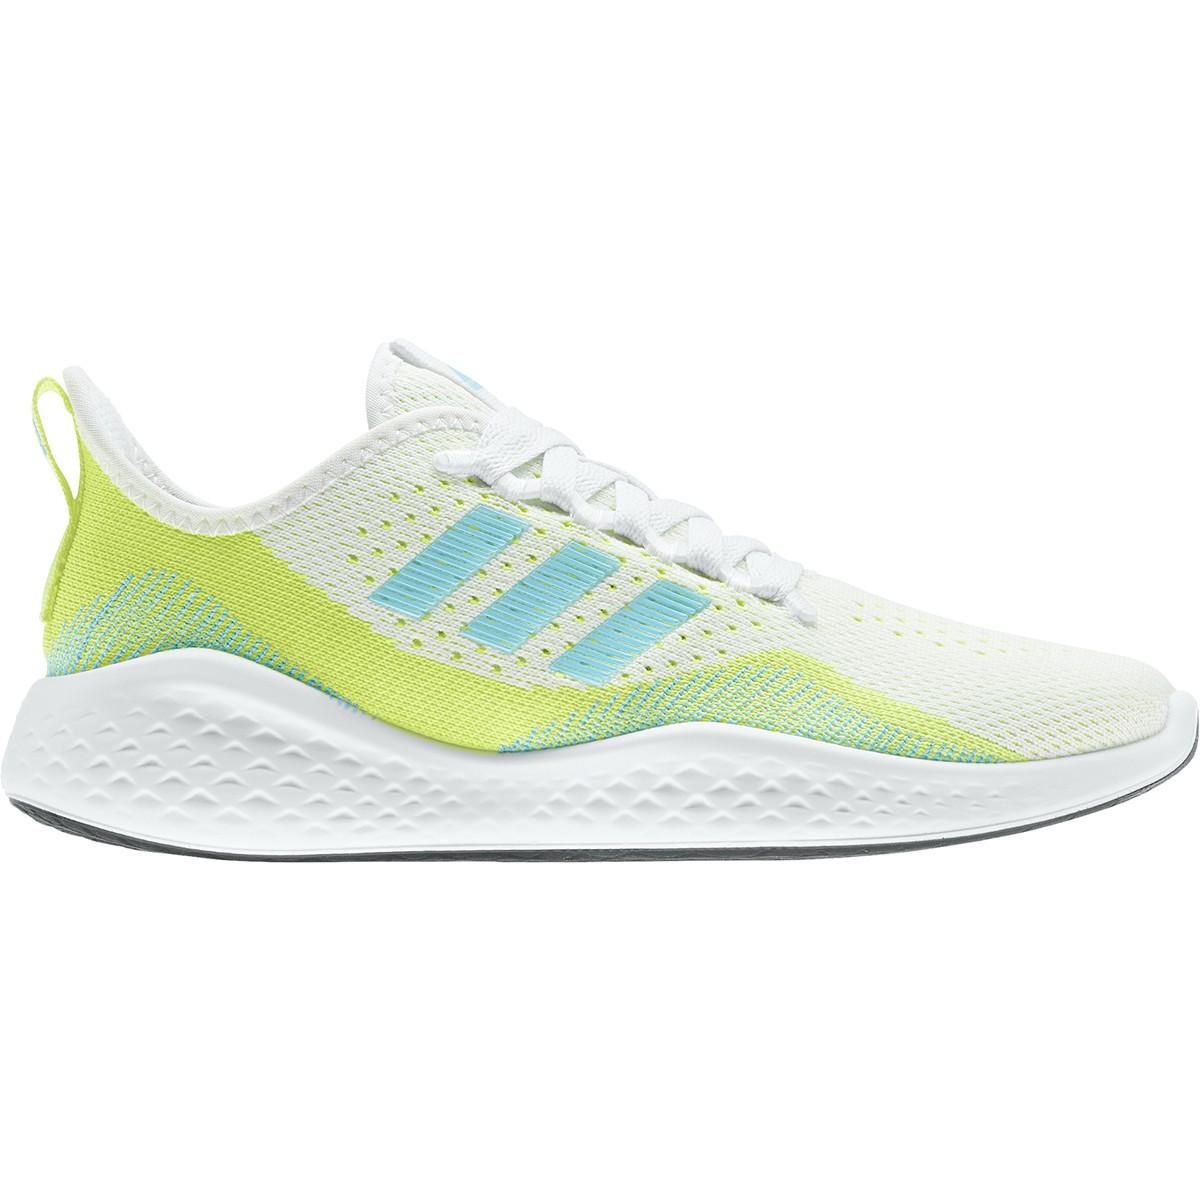 Adidas Women's Fluidflow 2.0